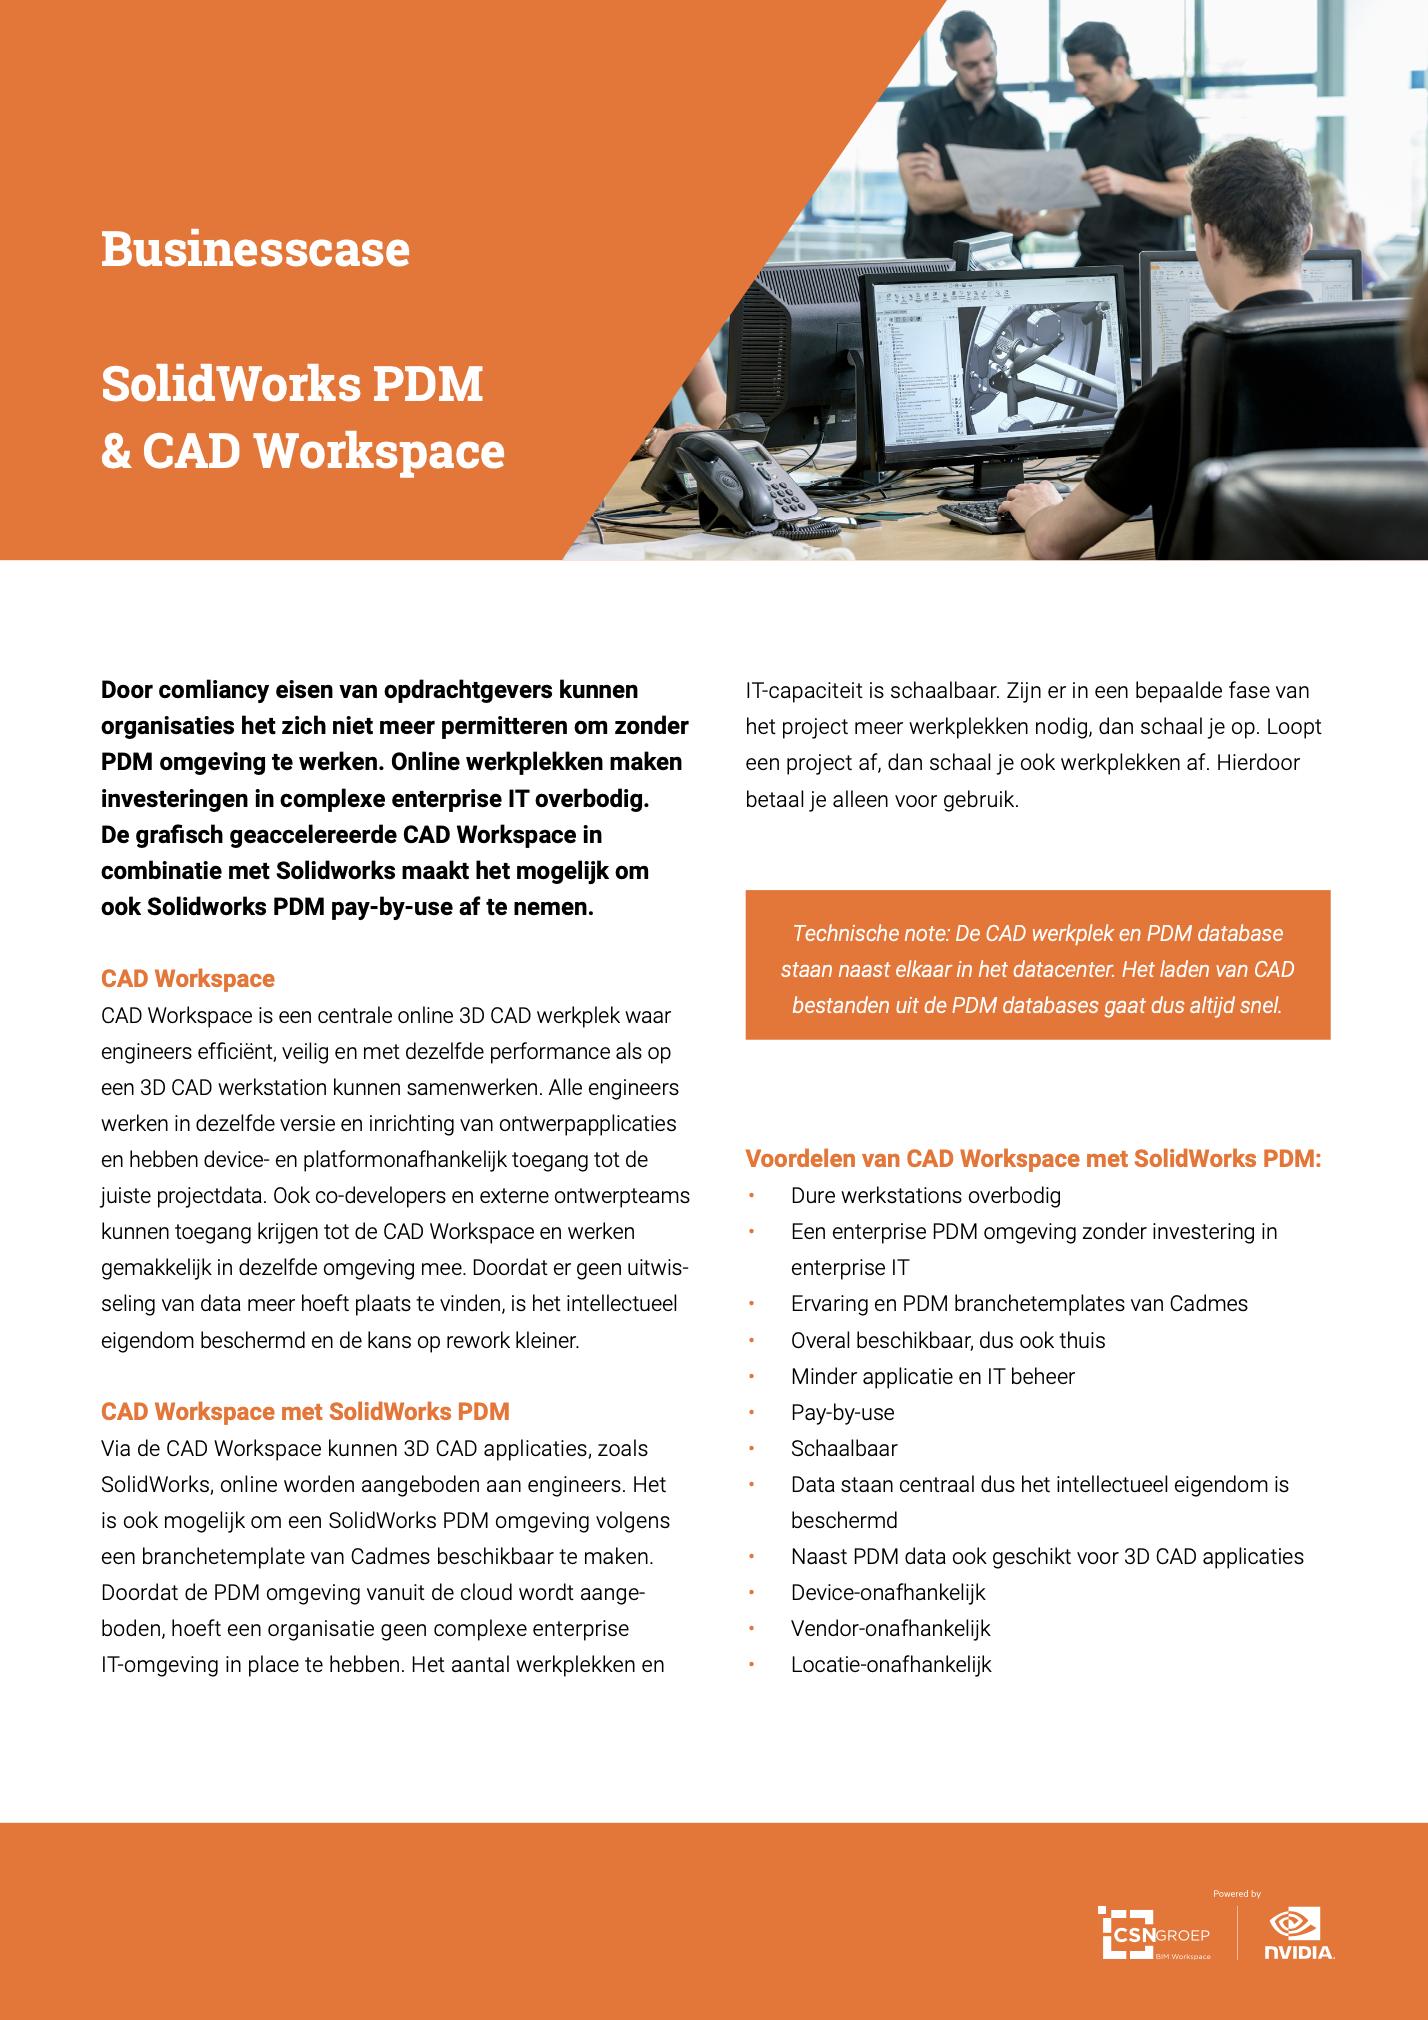 CAD Workspace & Solidworks PDM